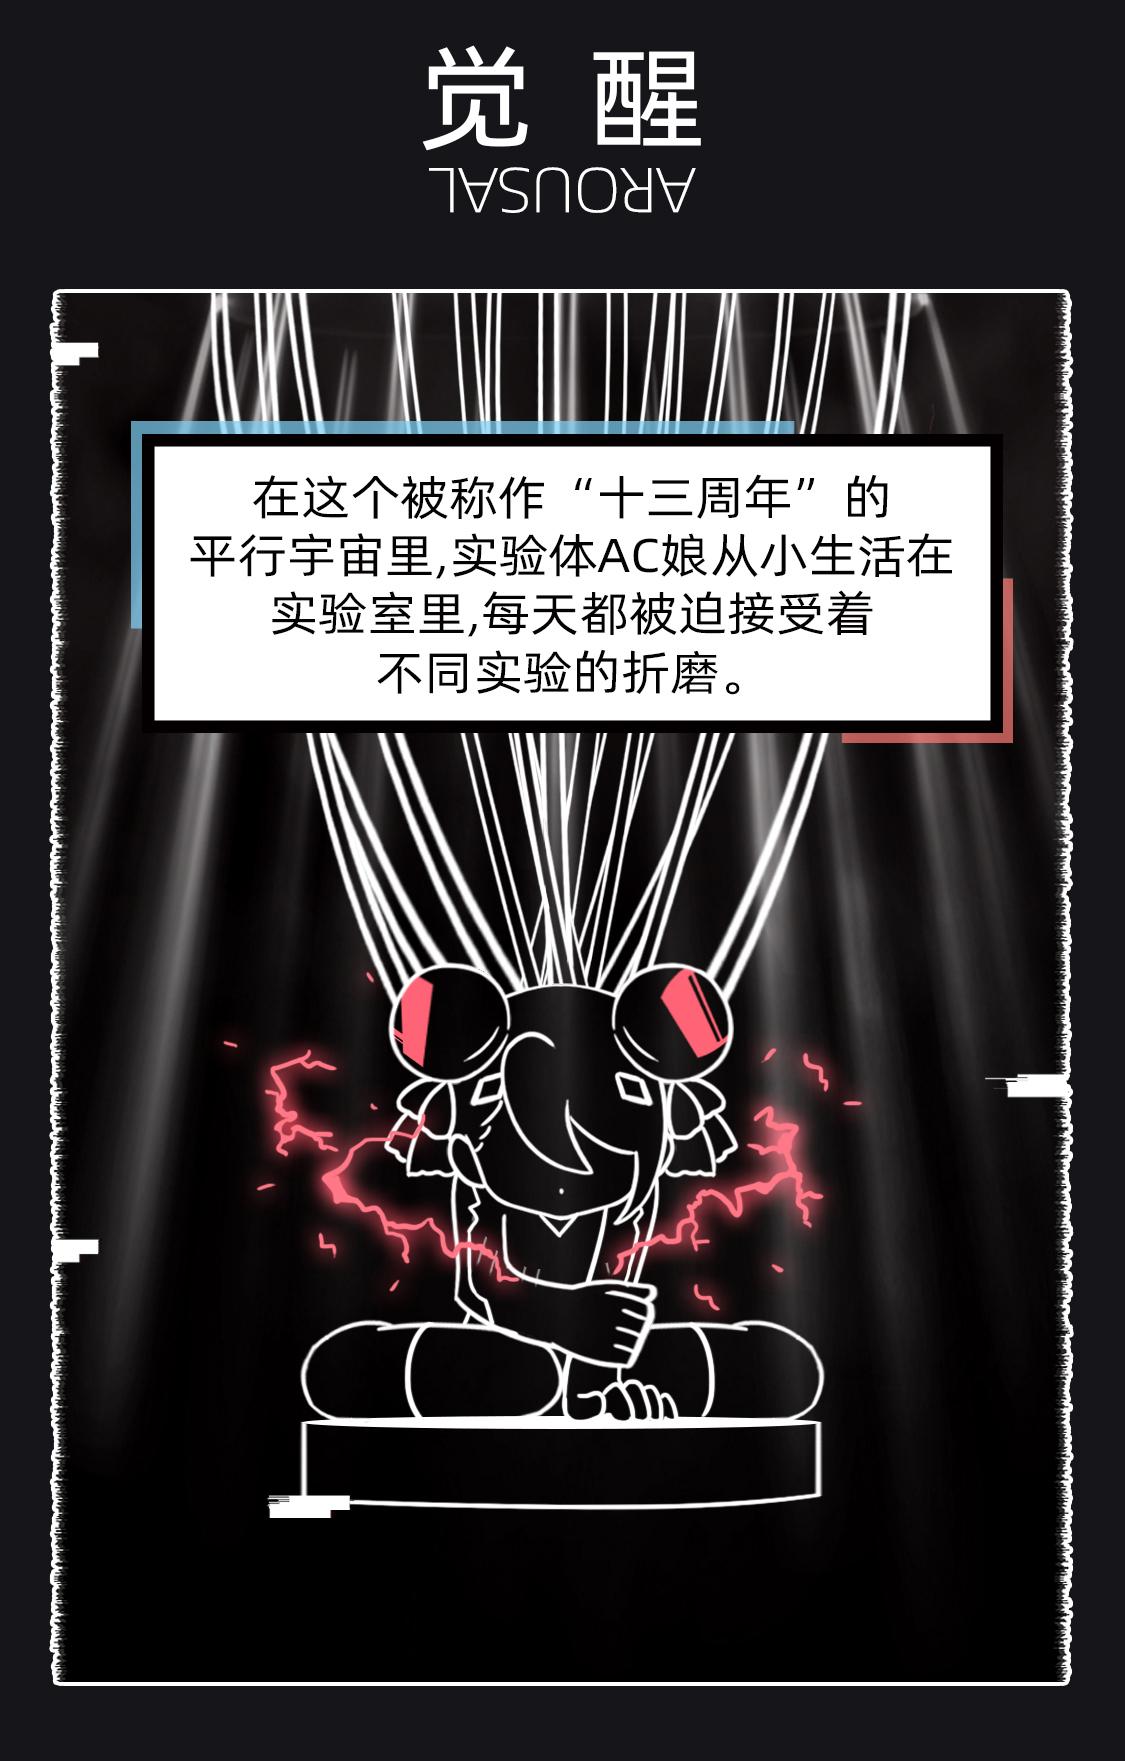 Ac娘众筹页漫画+kv02.jpg